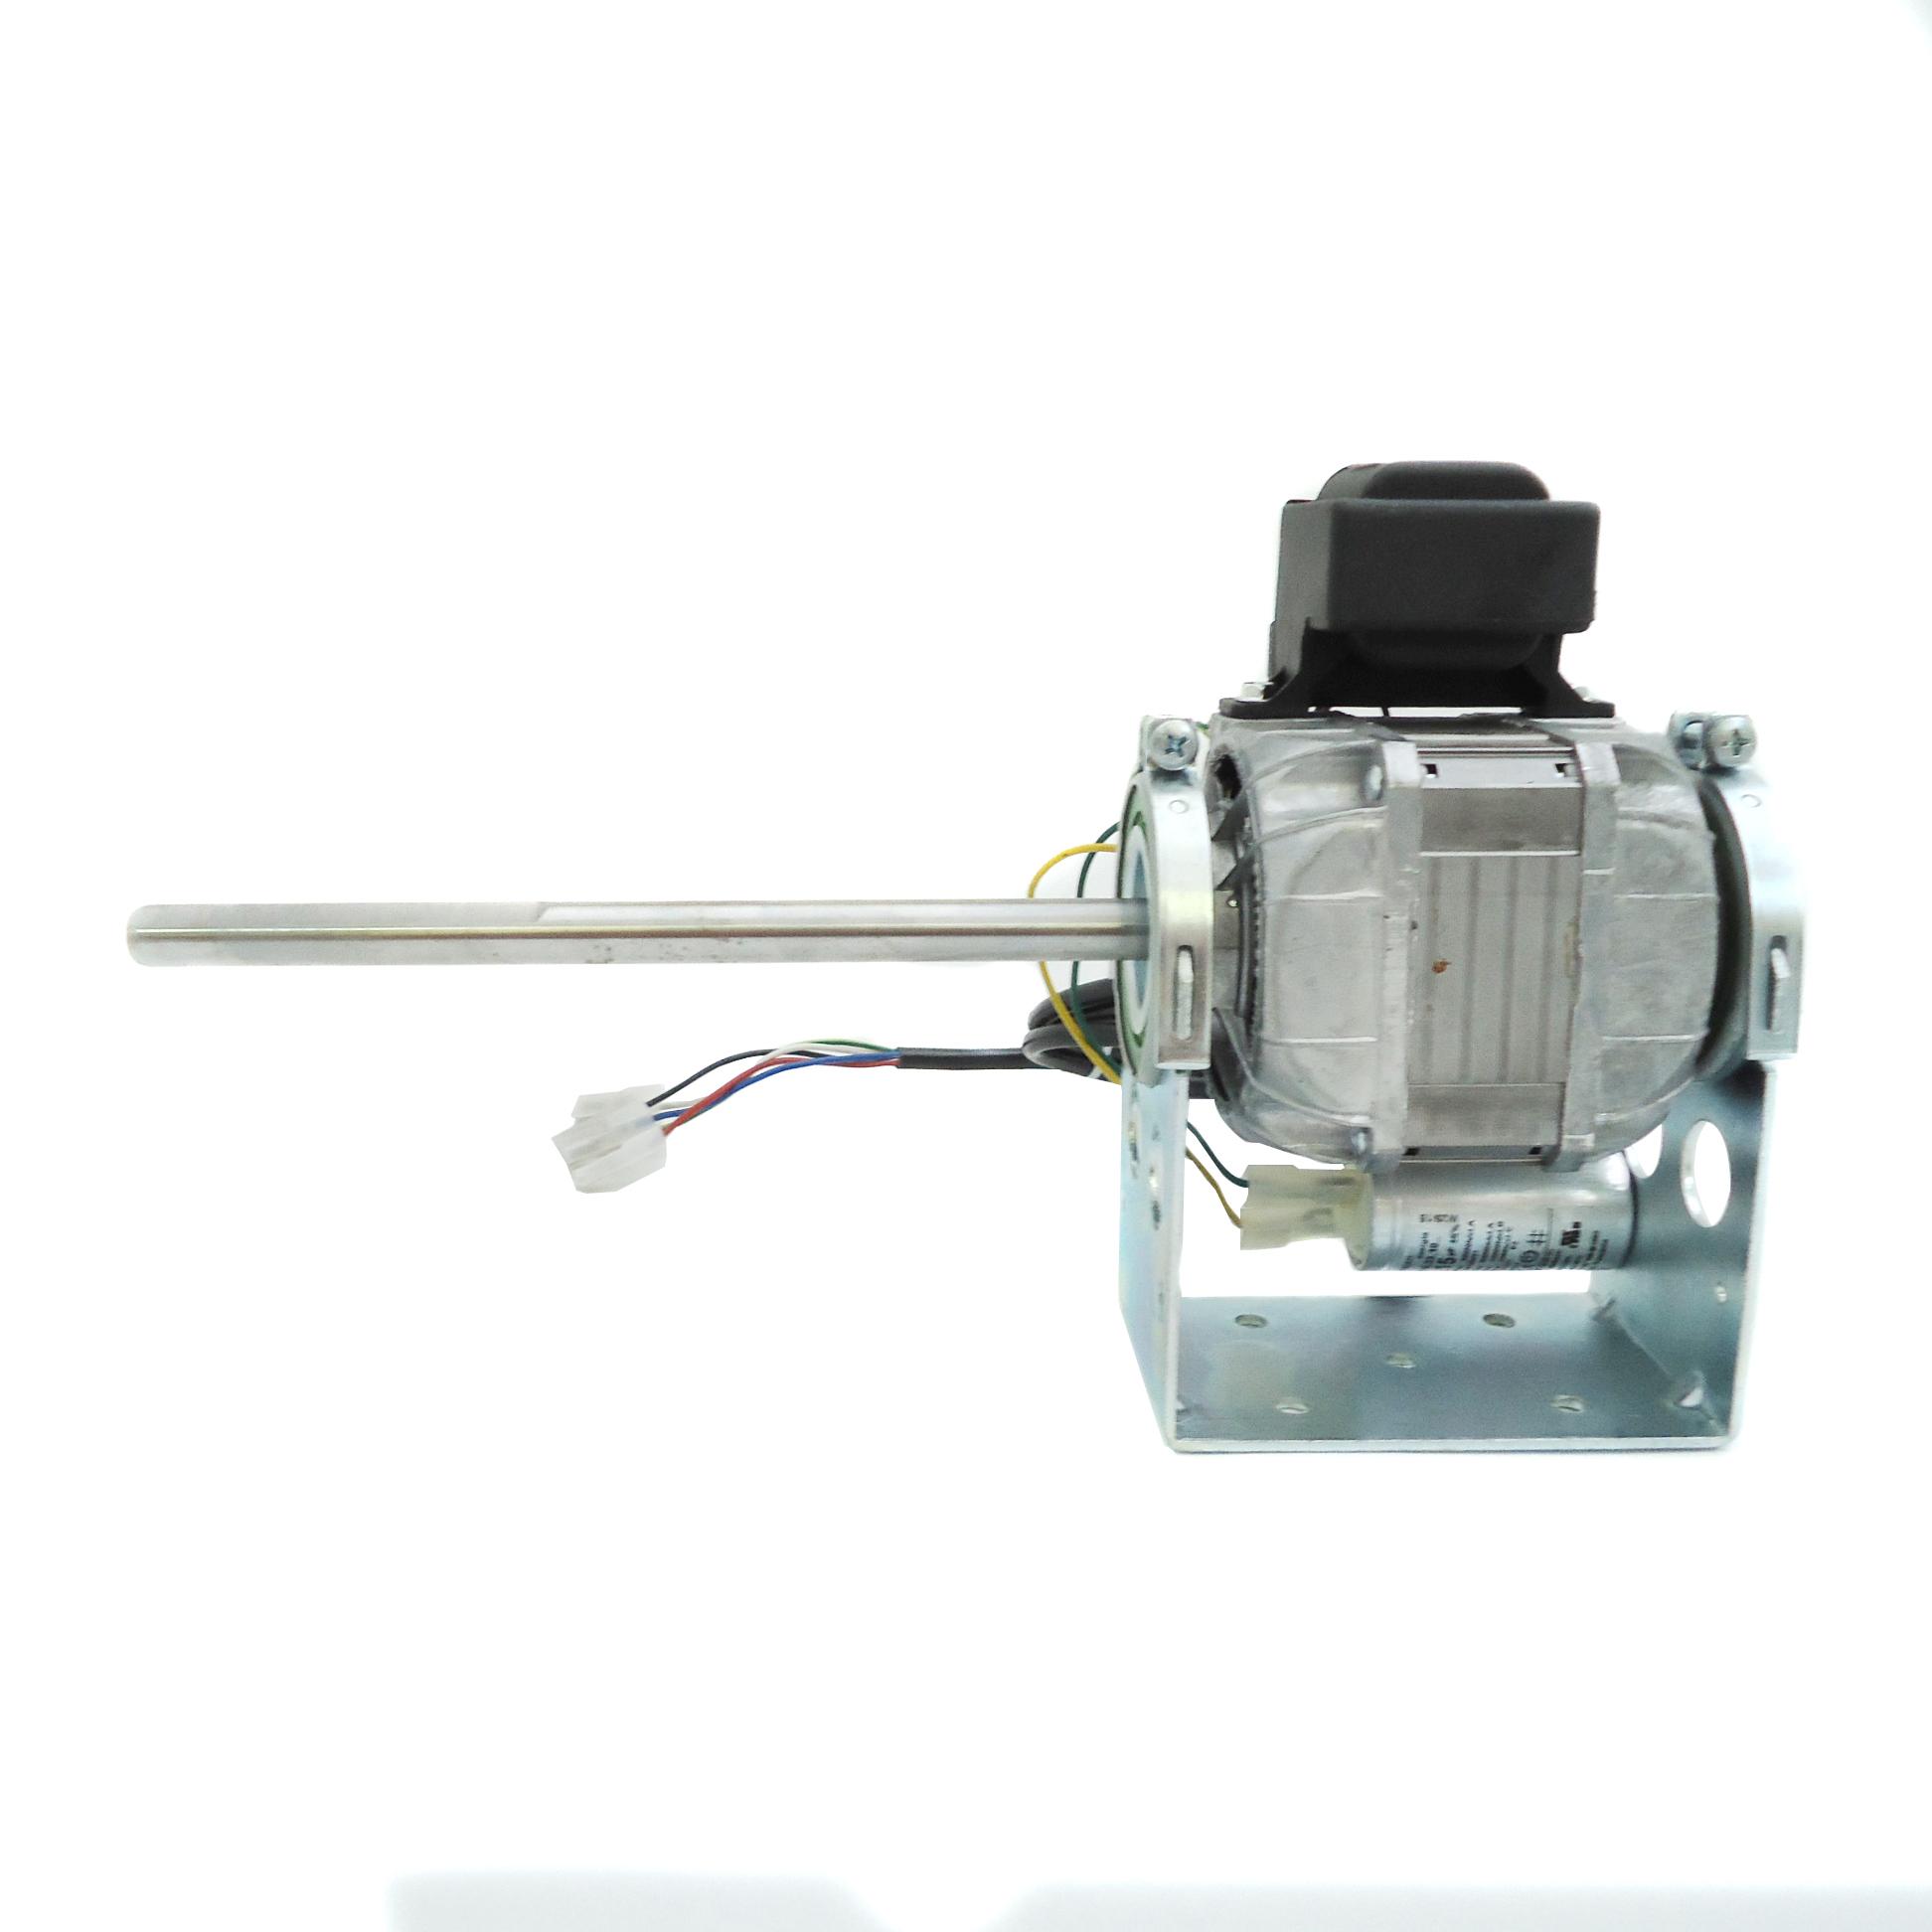 Euro Motors Italia A83M-2525 Ανεμιστήρας Fan Coil Με 1 Άξονα (Μήκος Άξονα: 169mm - 25Watt/230Volt)